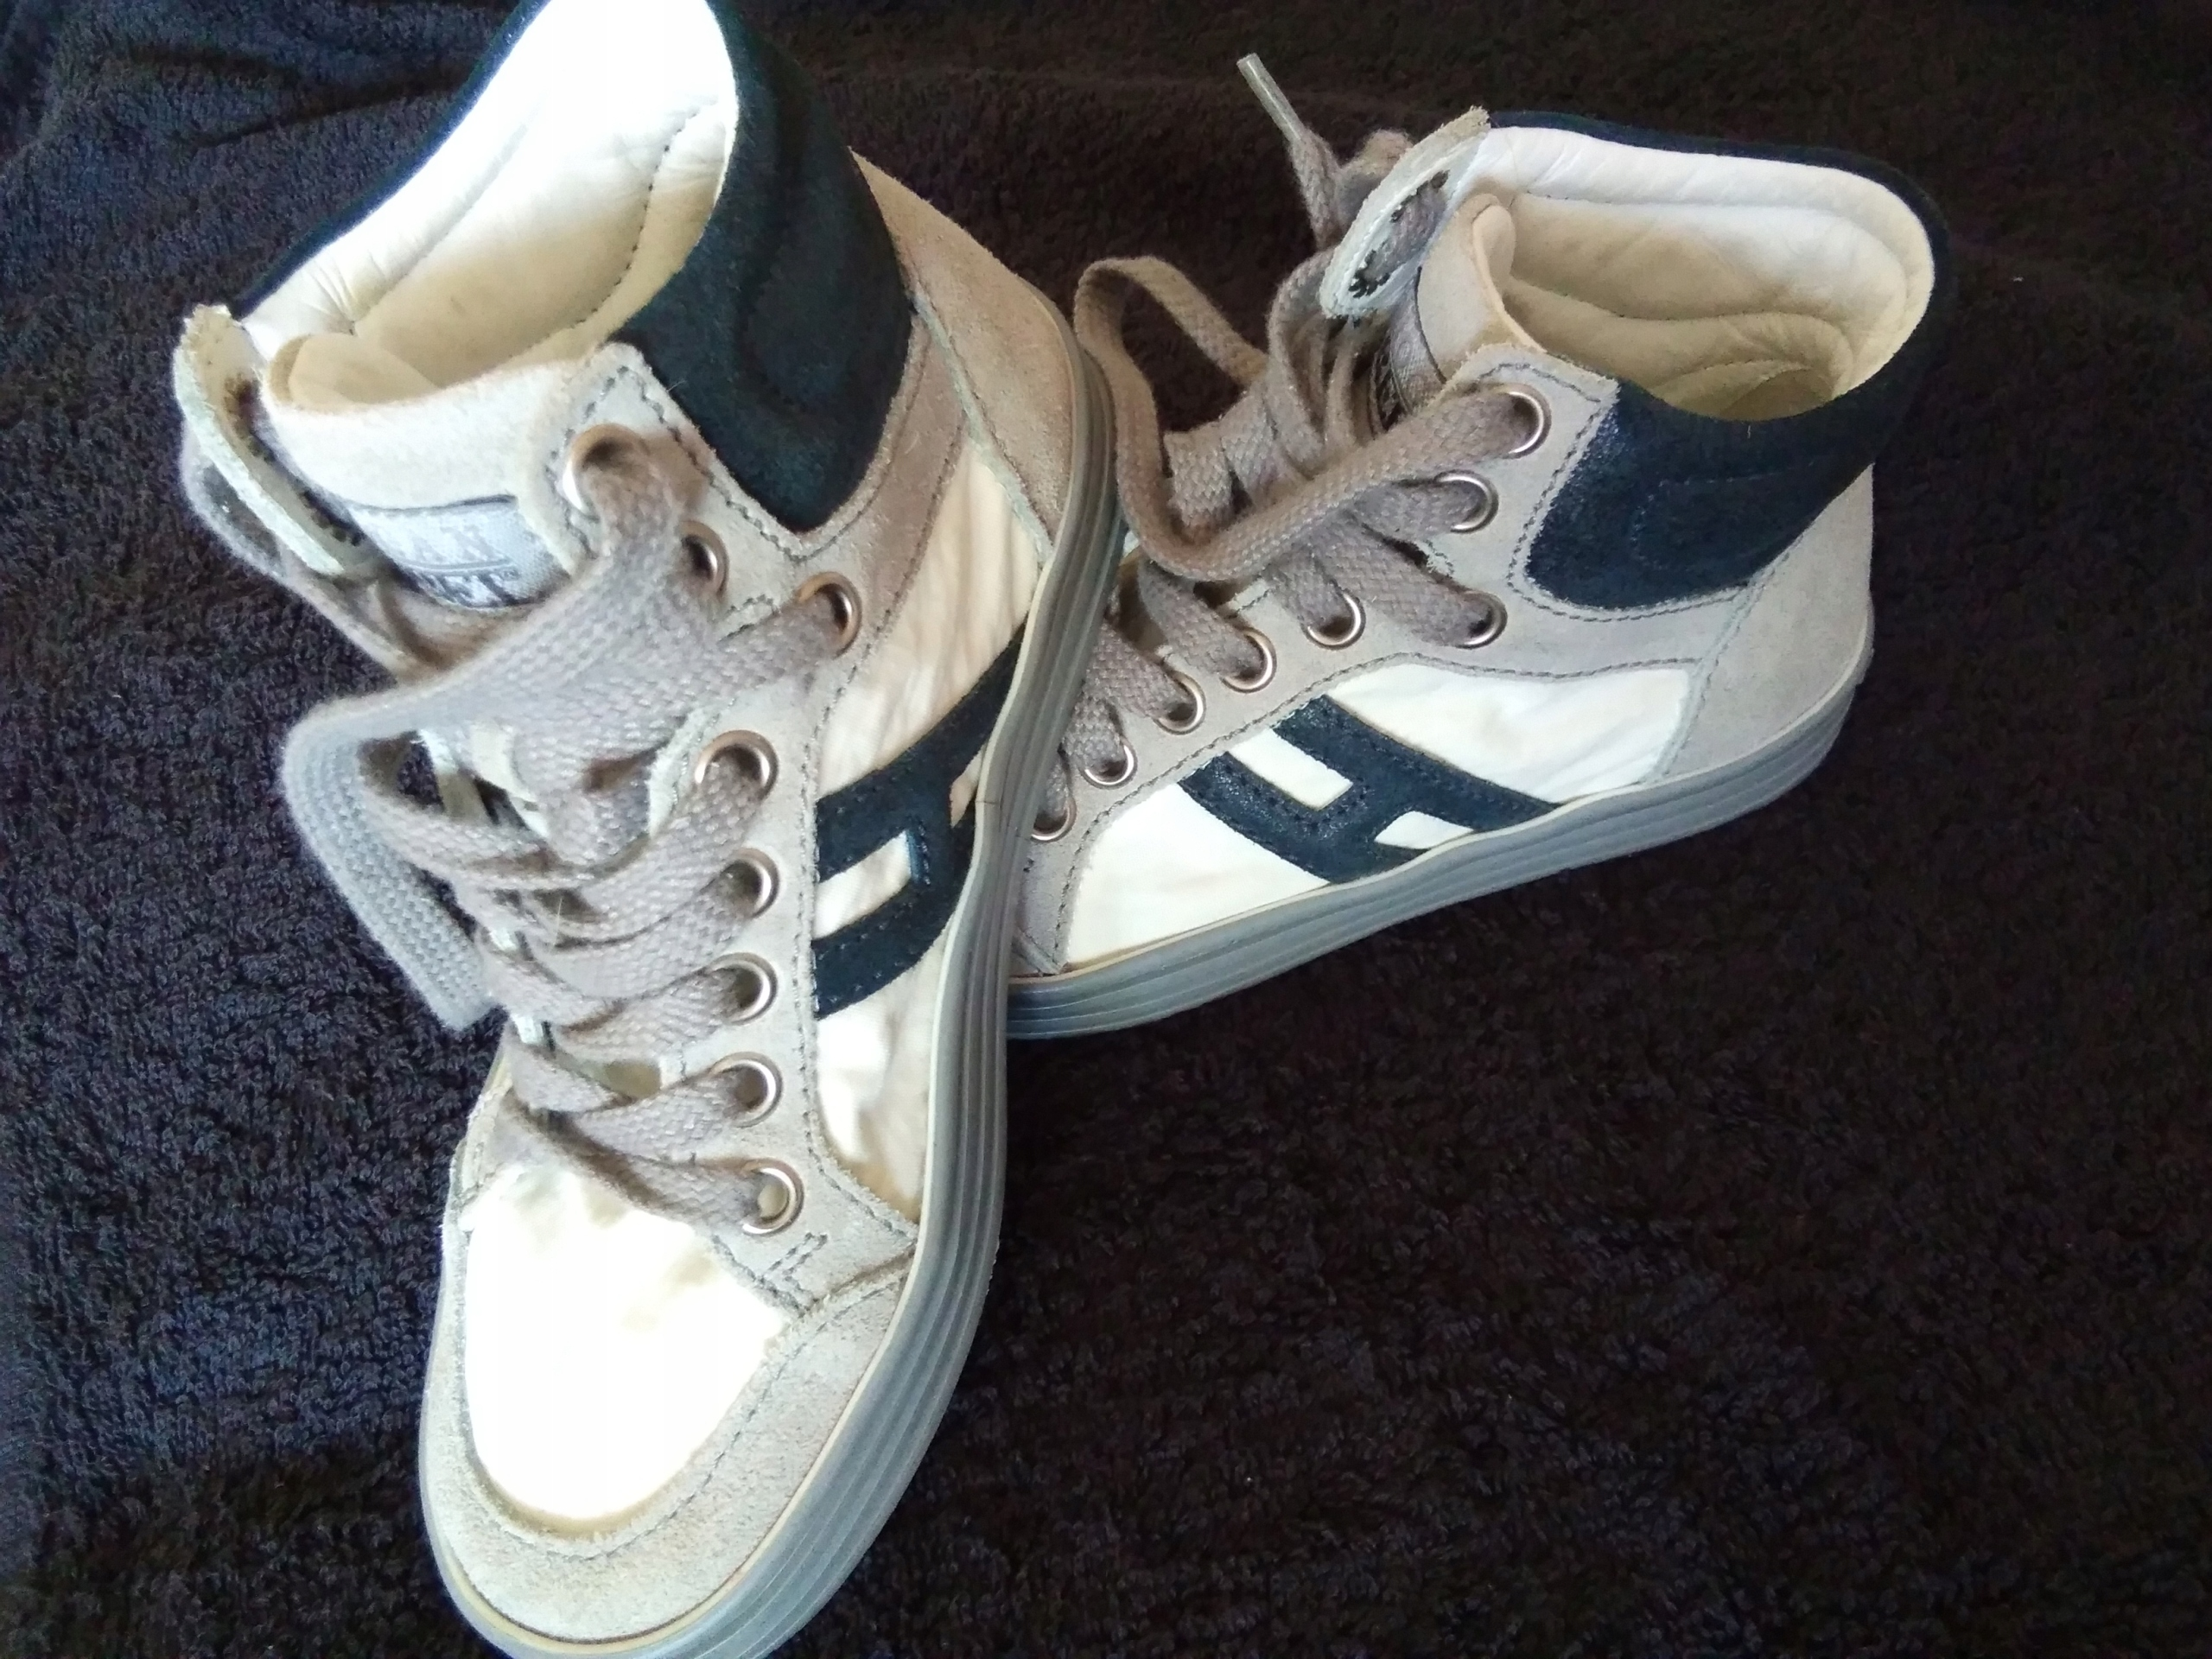 HOGAN Debel buty trampki dziecięce 29